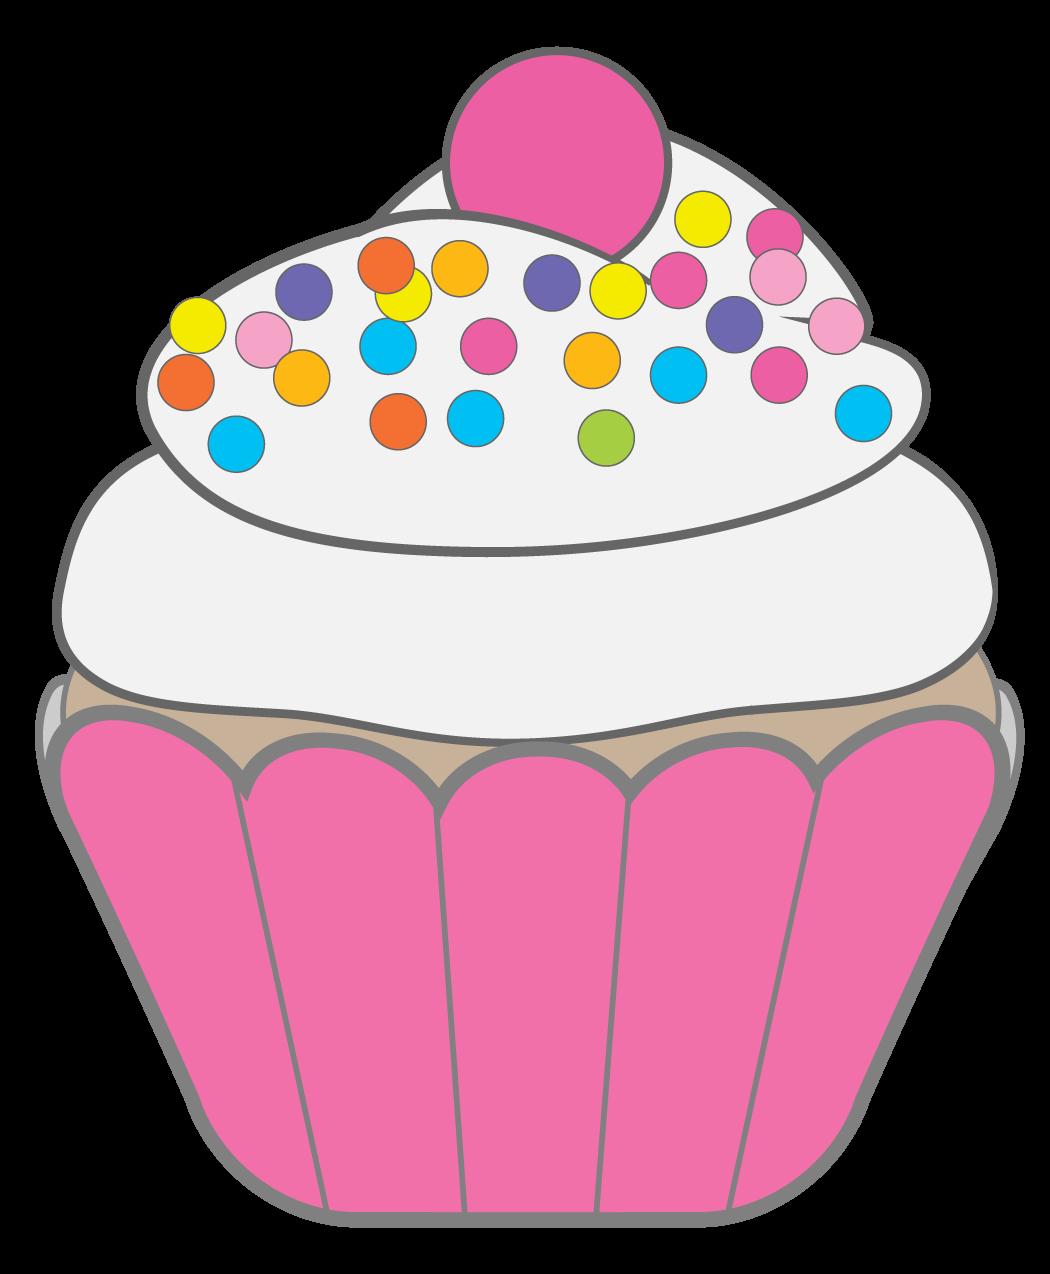 Cupcake Clip Art-Cupcake Clip Art-1